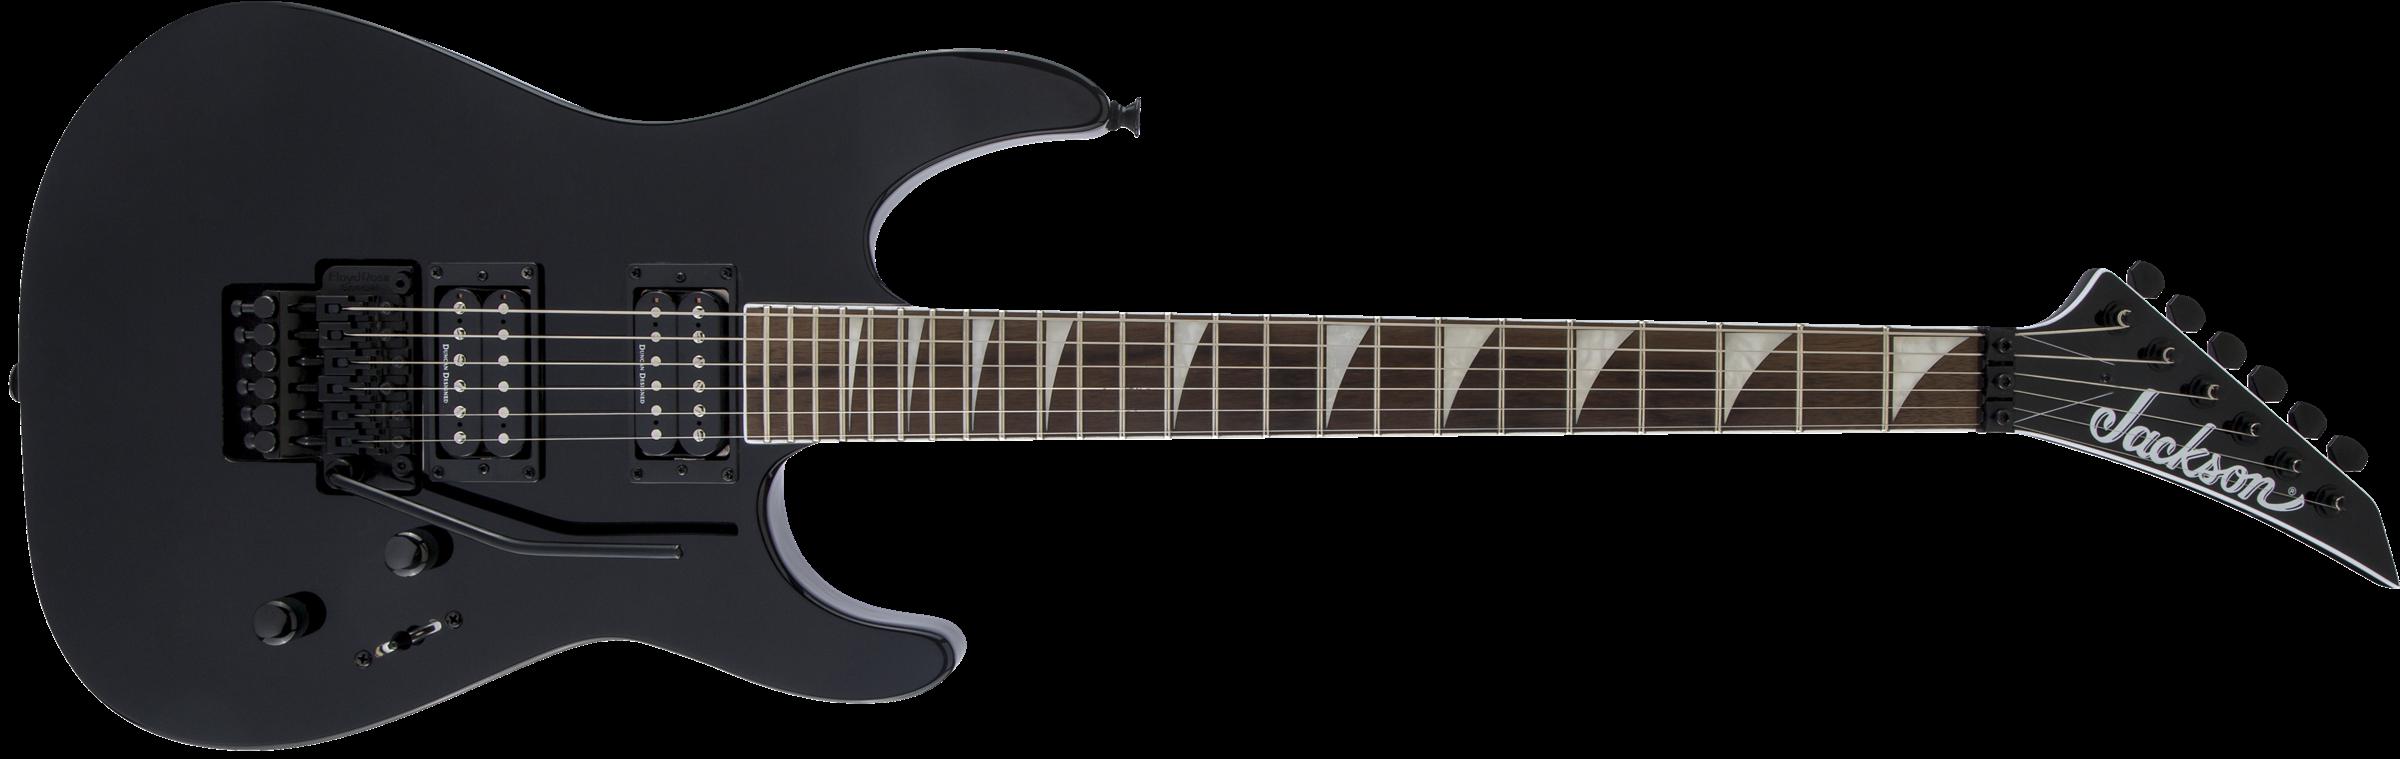 guitars x series soloist slx rosewood fingerboard black. Black Bedroom Furniture Sets. Home Design Ideas